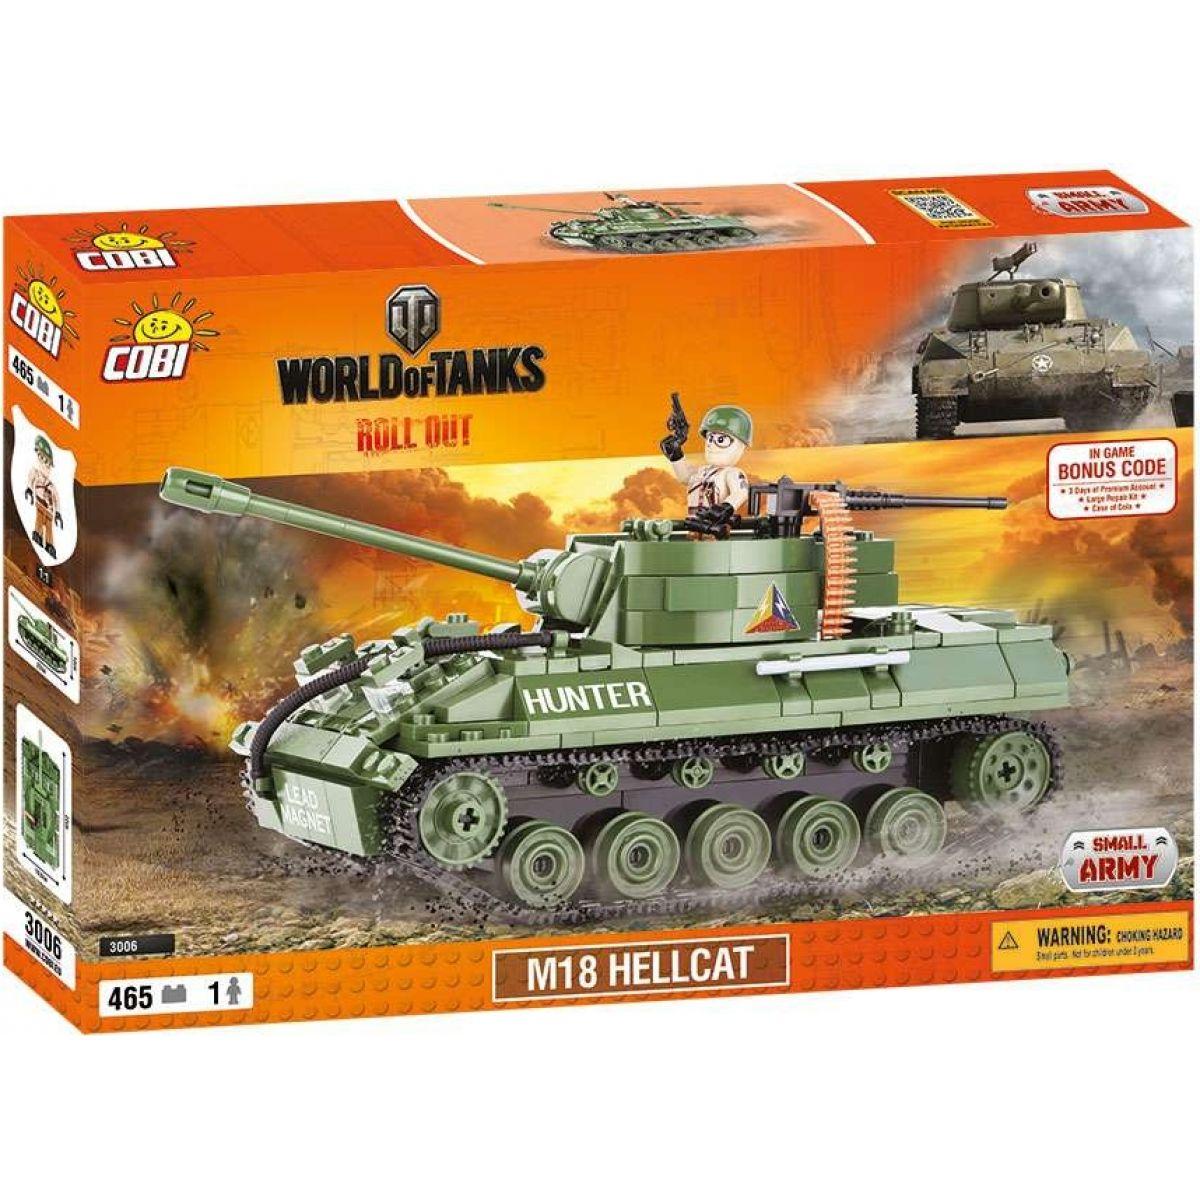 Cobi Malá armáda 3006 World of Tanks M18 Hellcat